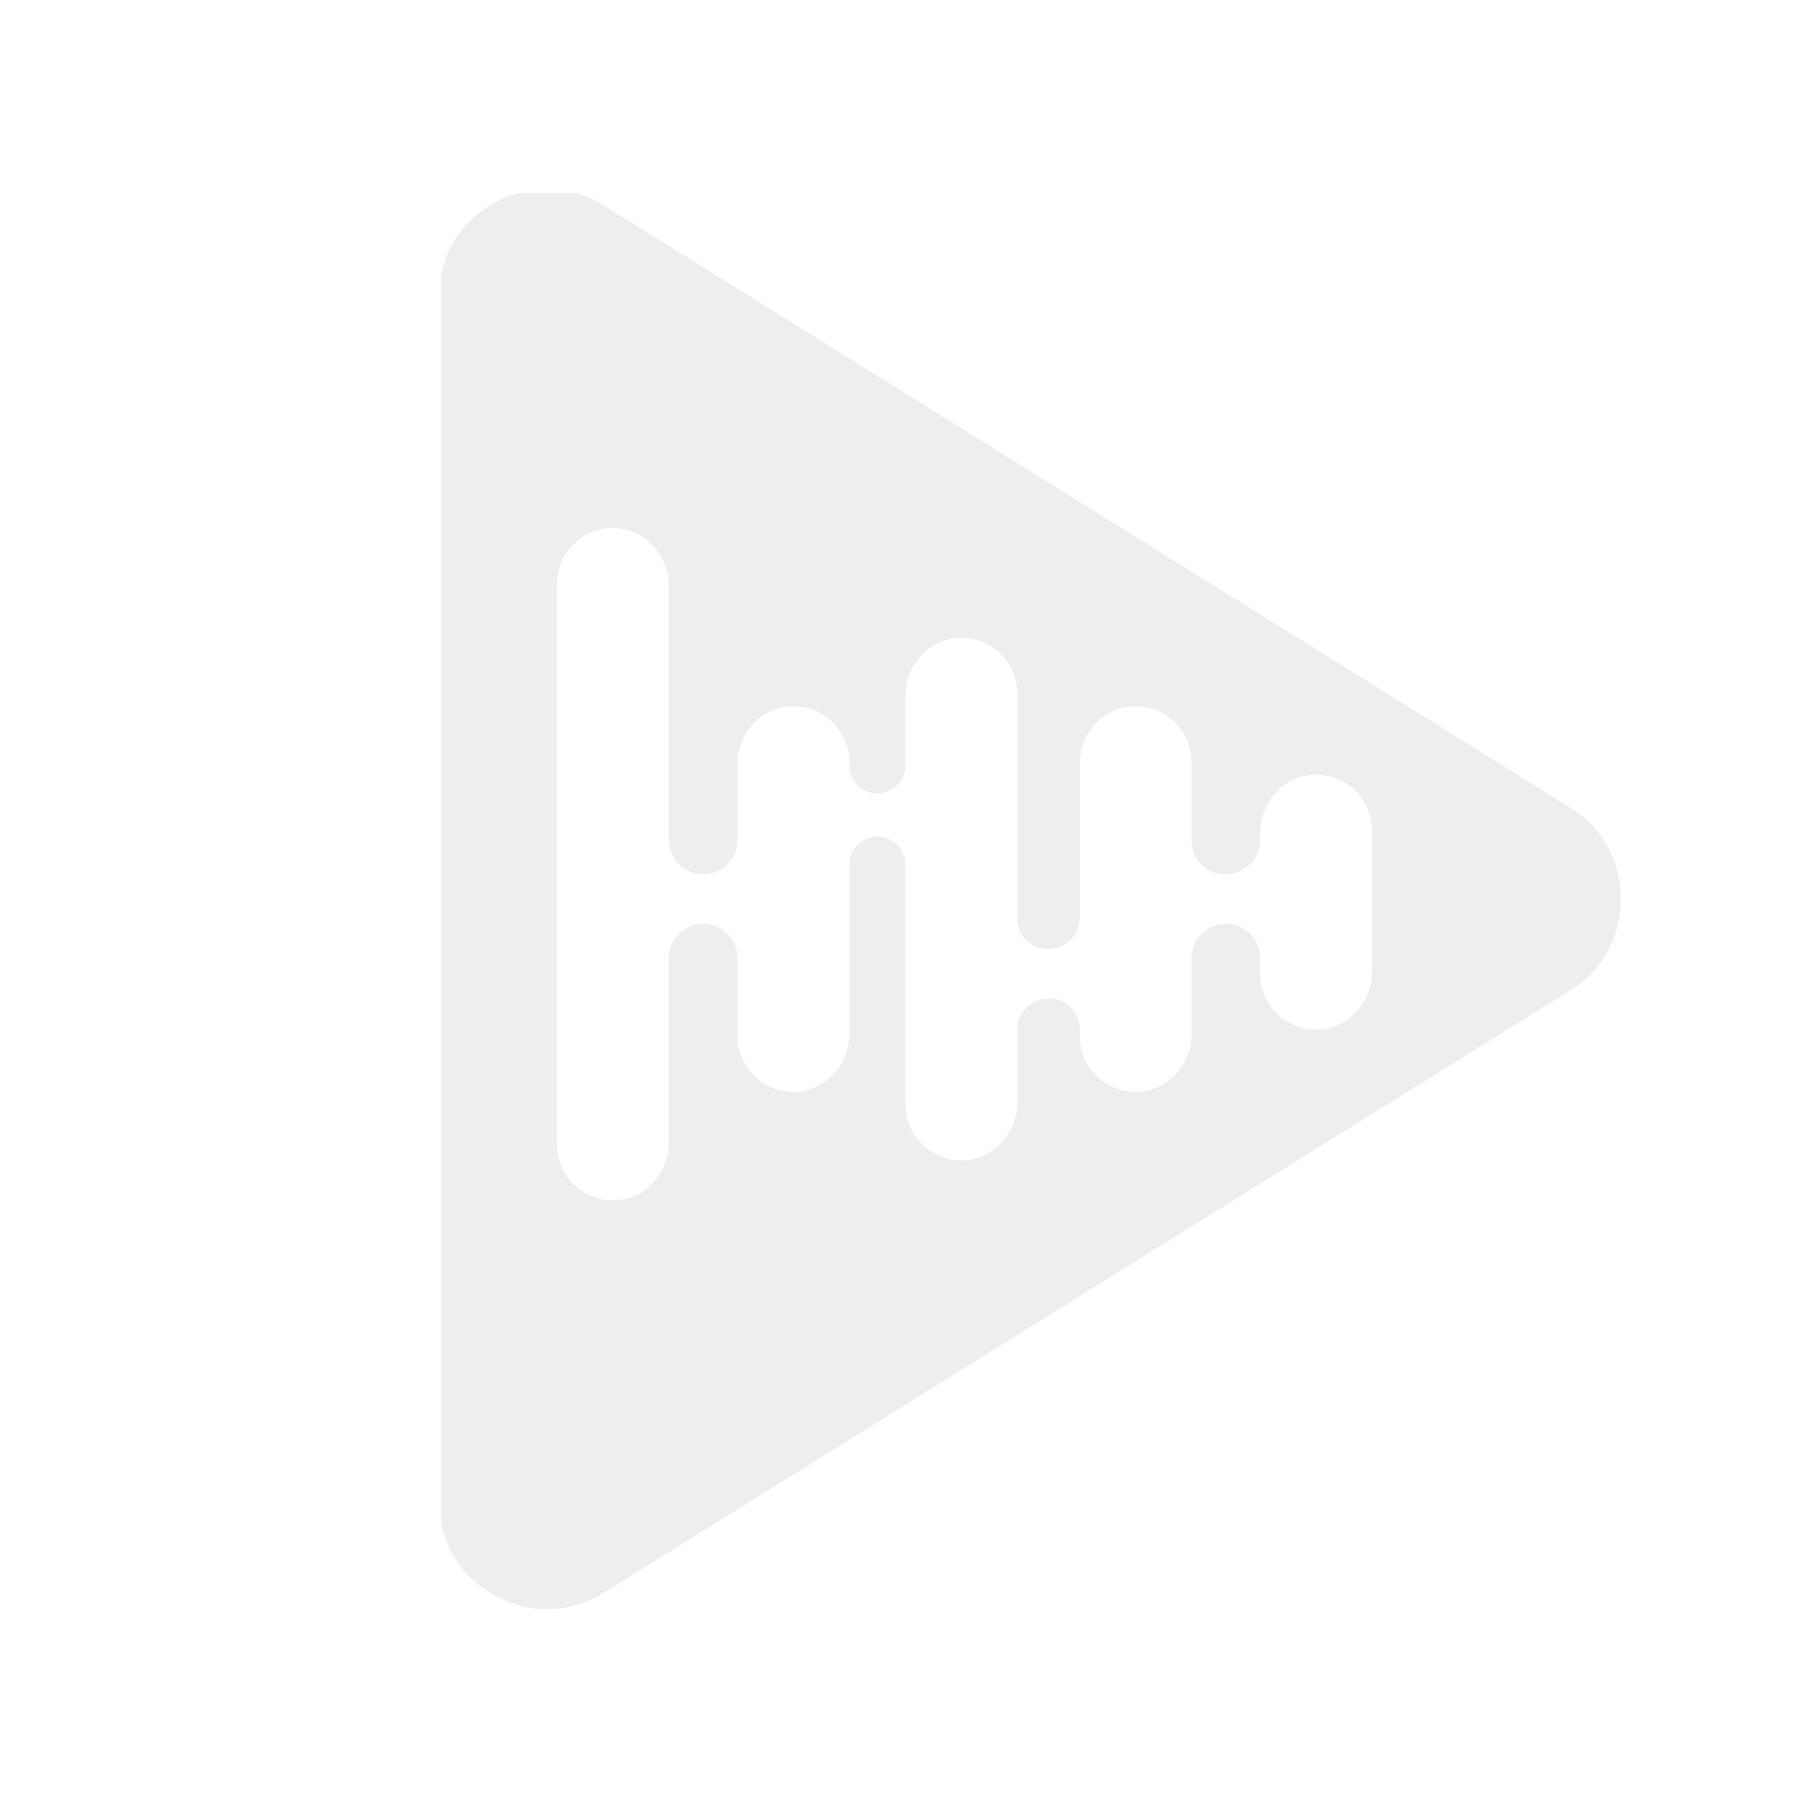 Klipsch 1060814 - HF, diskant til Klipsch Premiere-serien, stk